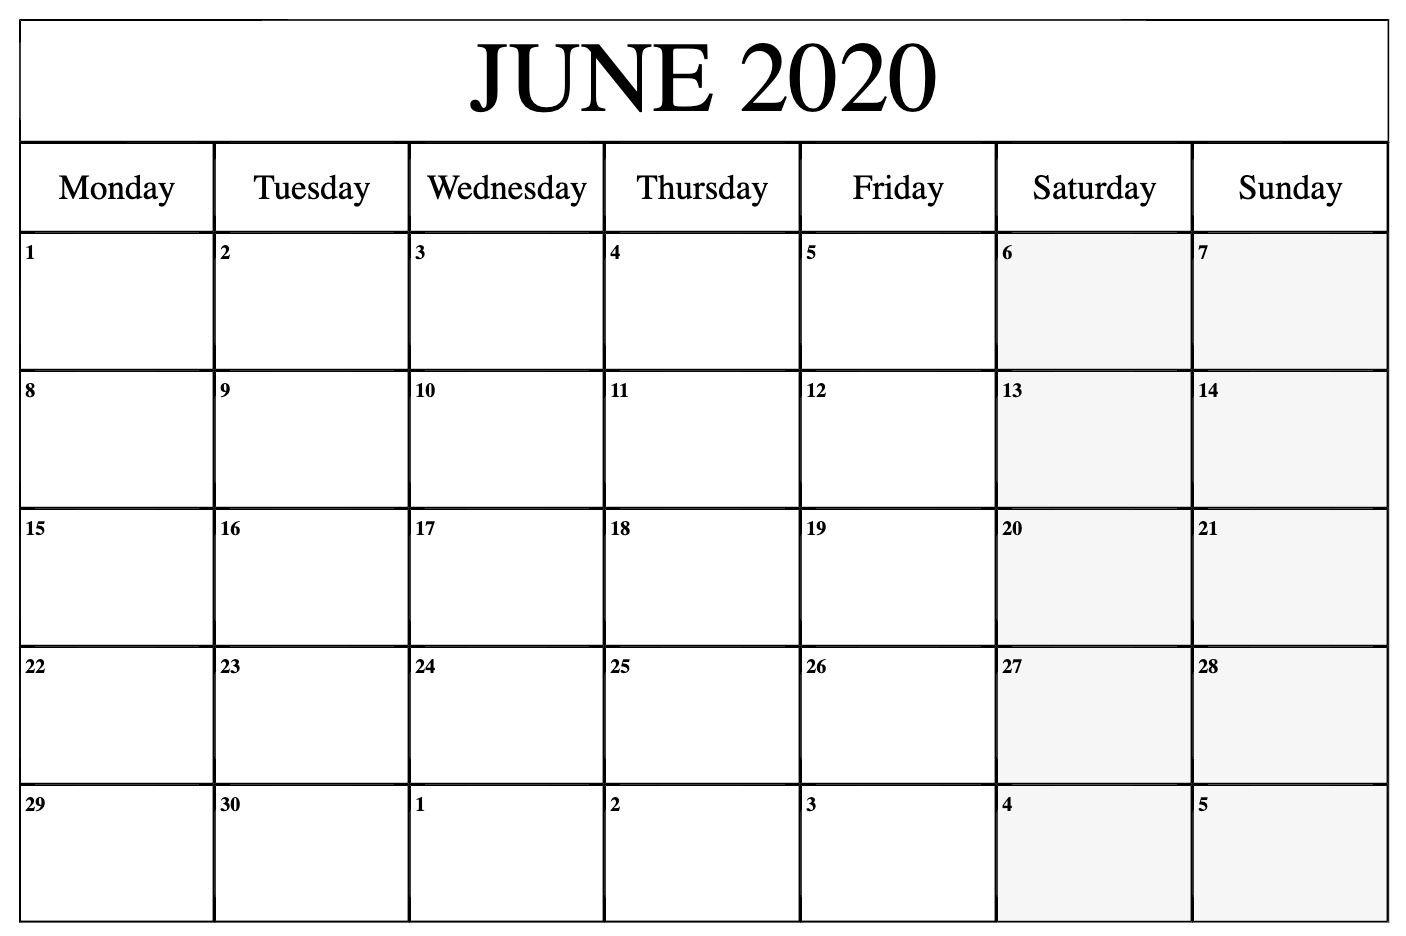 Print June 2020 Calendar Excel Sheet Free Printable Calendar In 2020 Monthly Calendar Template December Calendar Calendar Printables